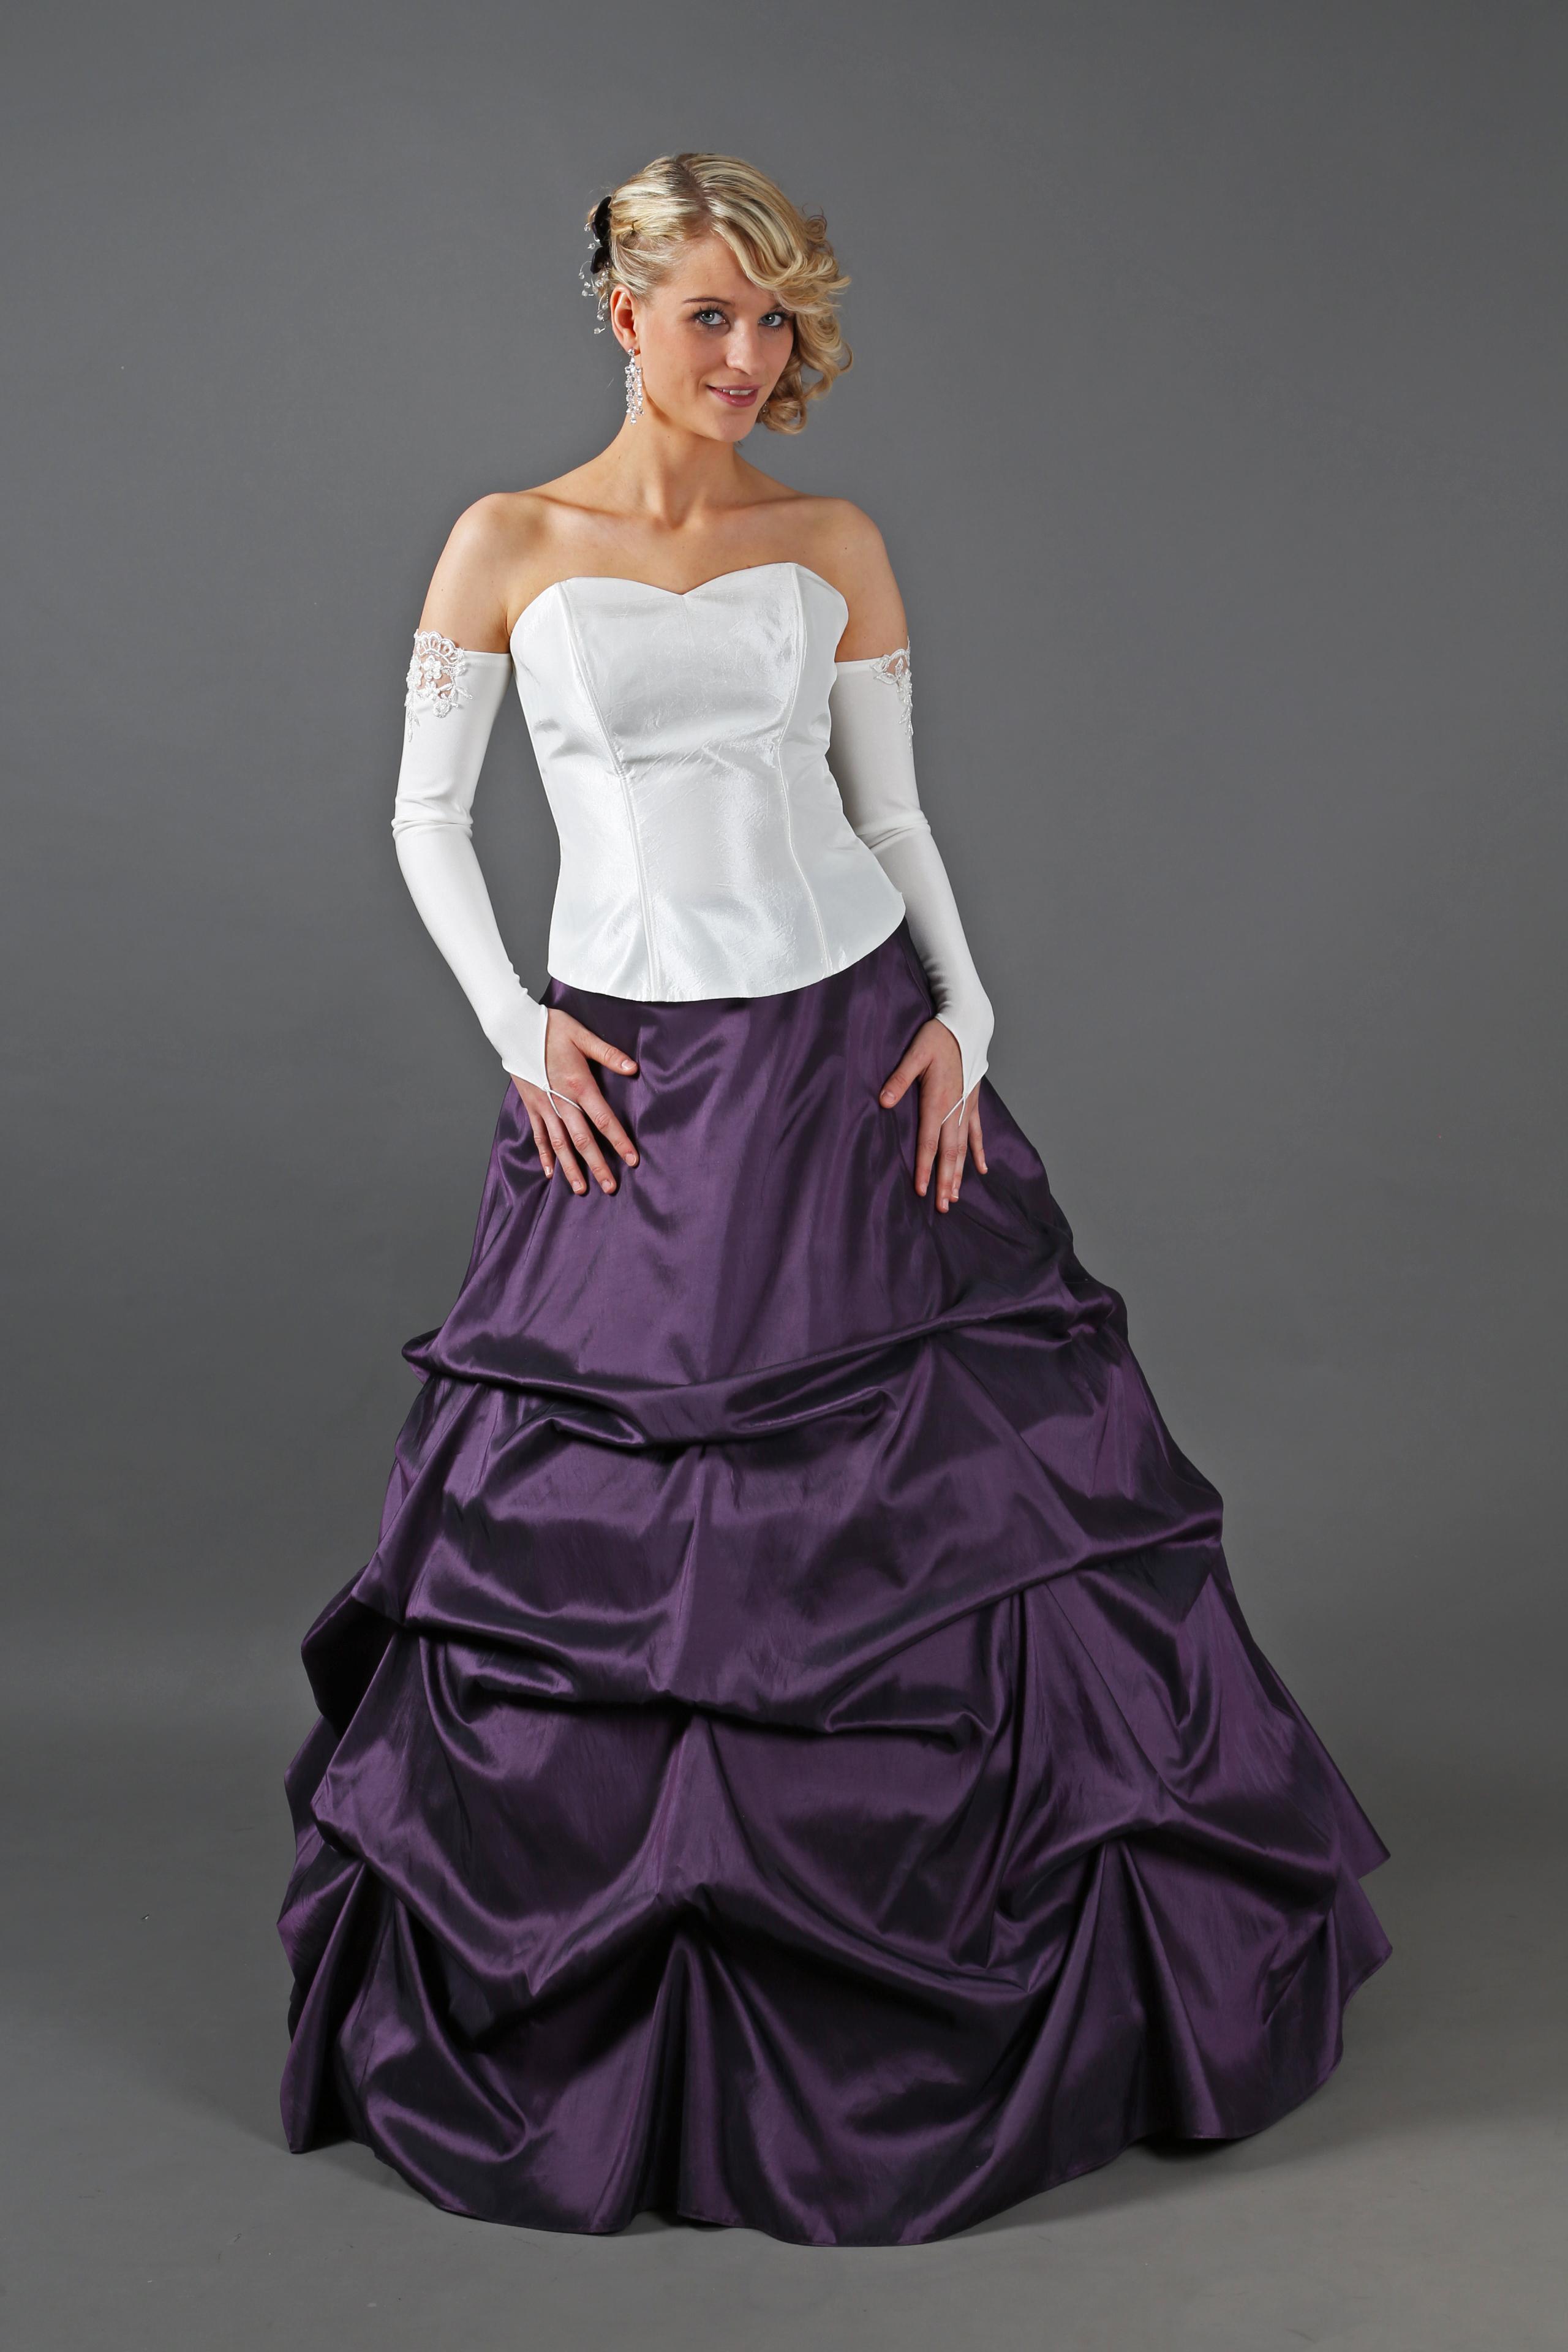 Drapiertes Brautkleid lila creme ivory - Kleiderfreuden